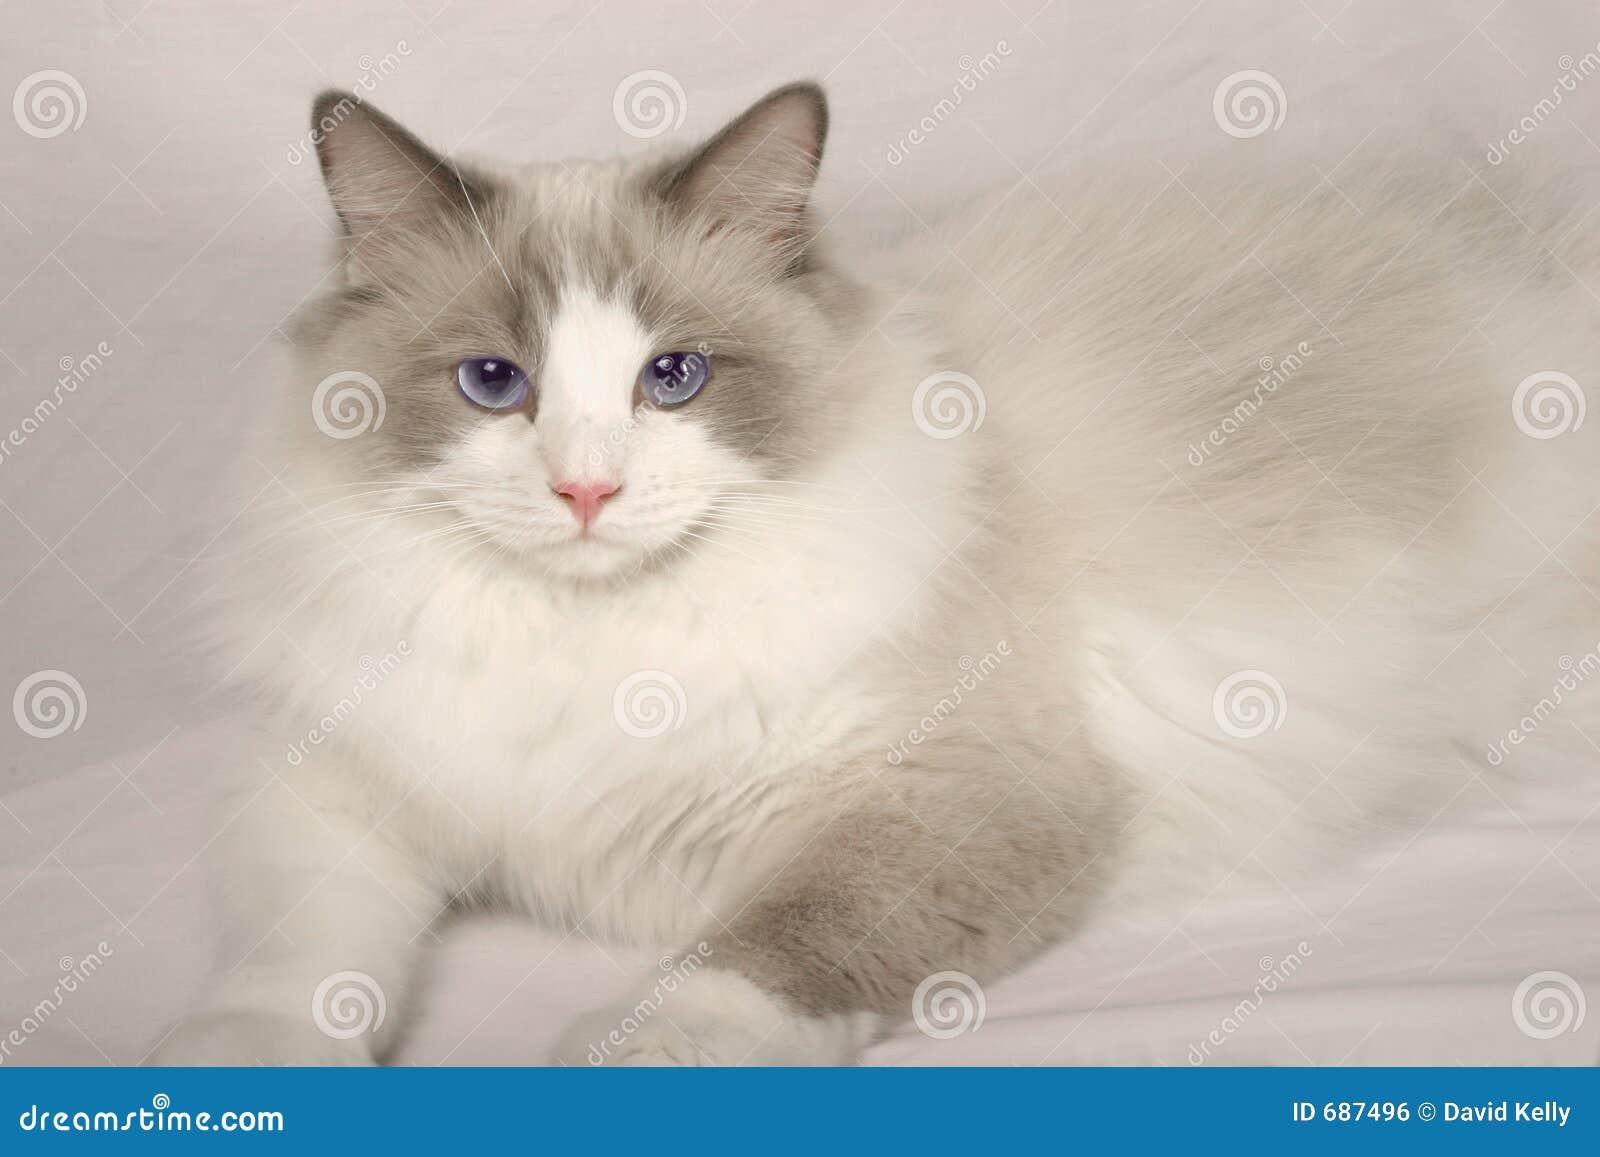 Rag Doll Cat Royalty Free Stock Image - Image: 687496